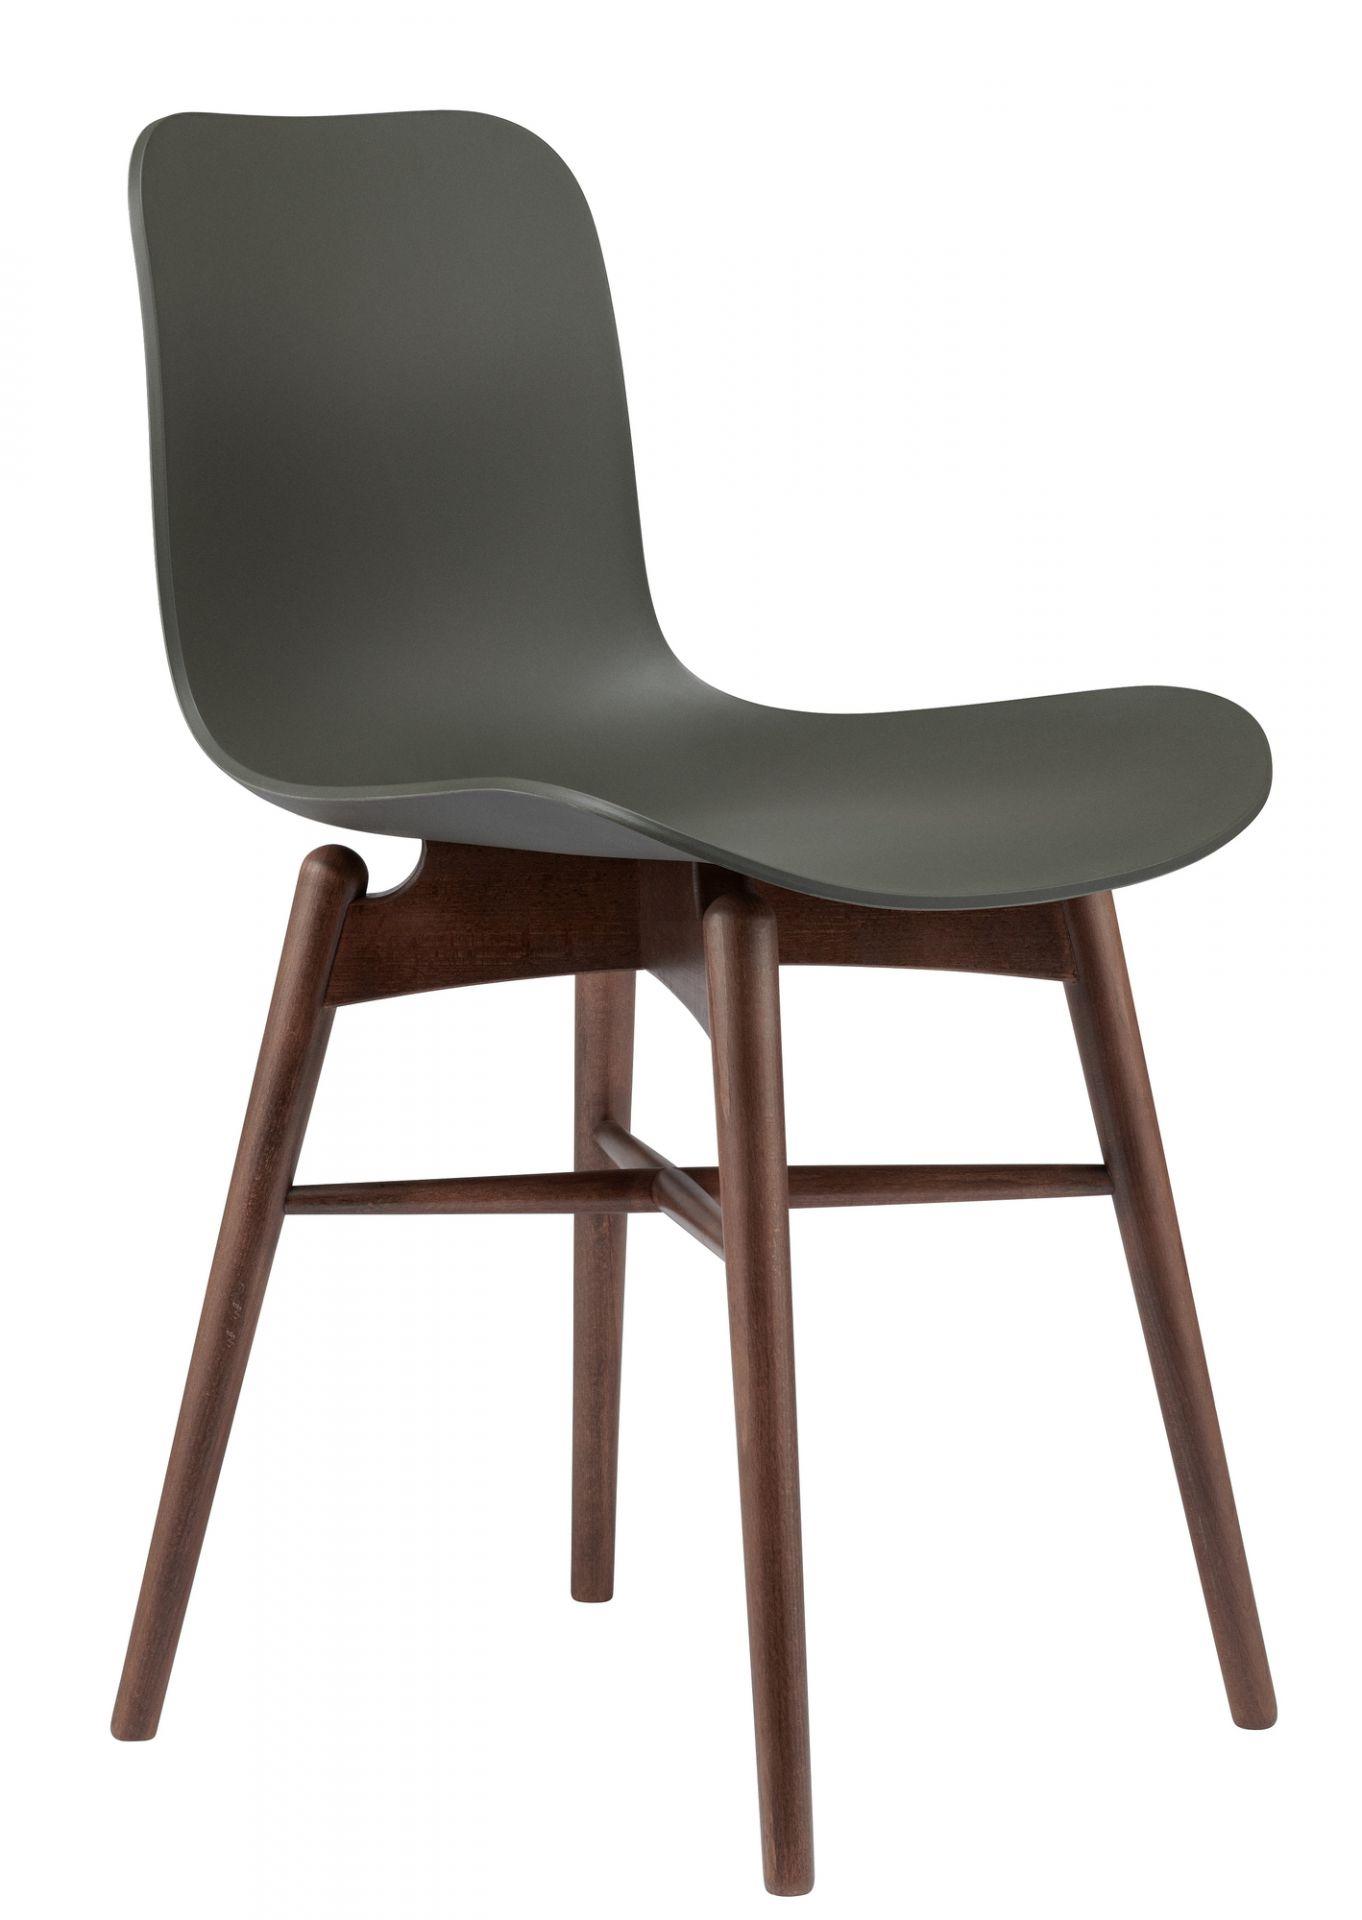 Langue Original Dining Chair Stuhl NORR11 Eiche natur Burgundy